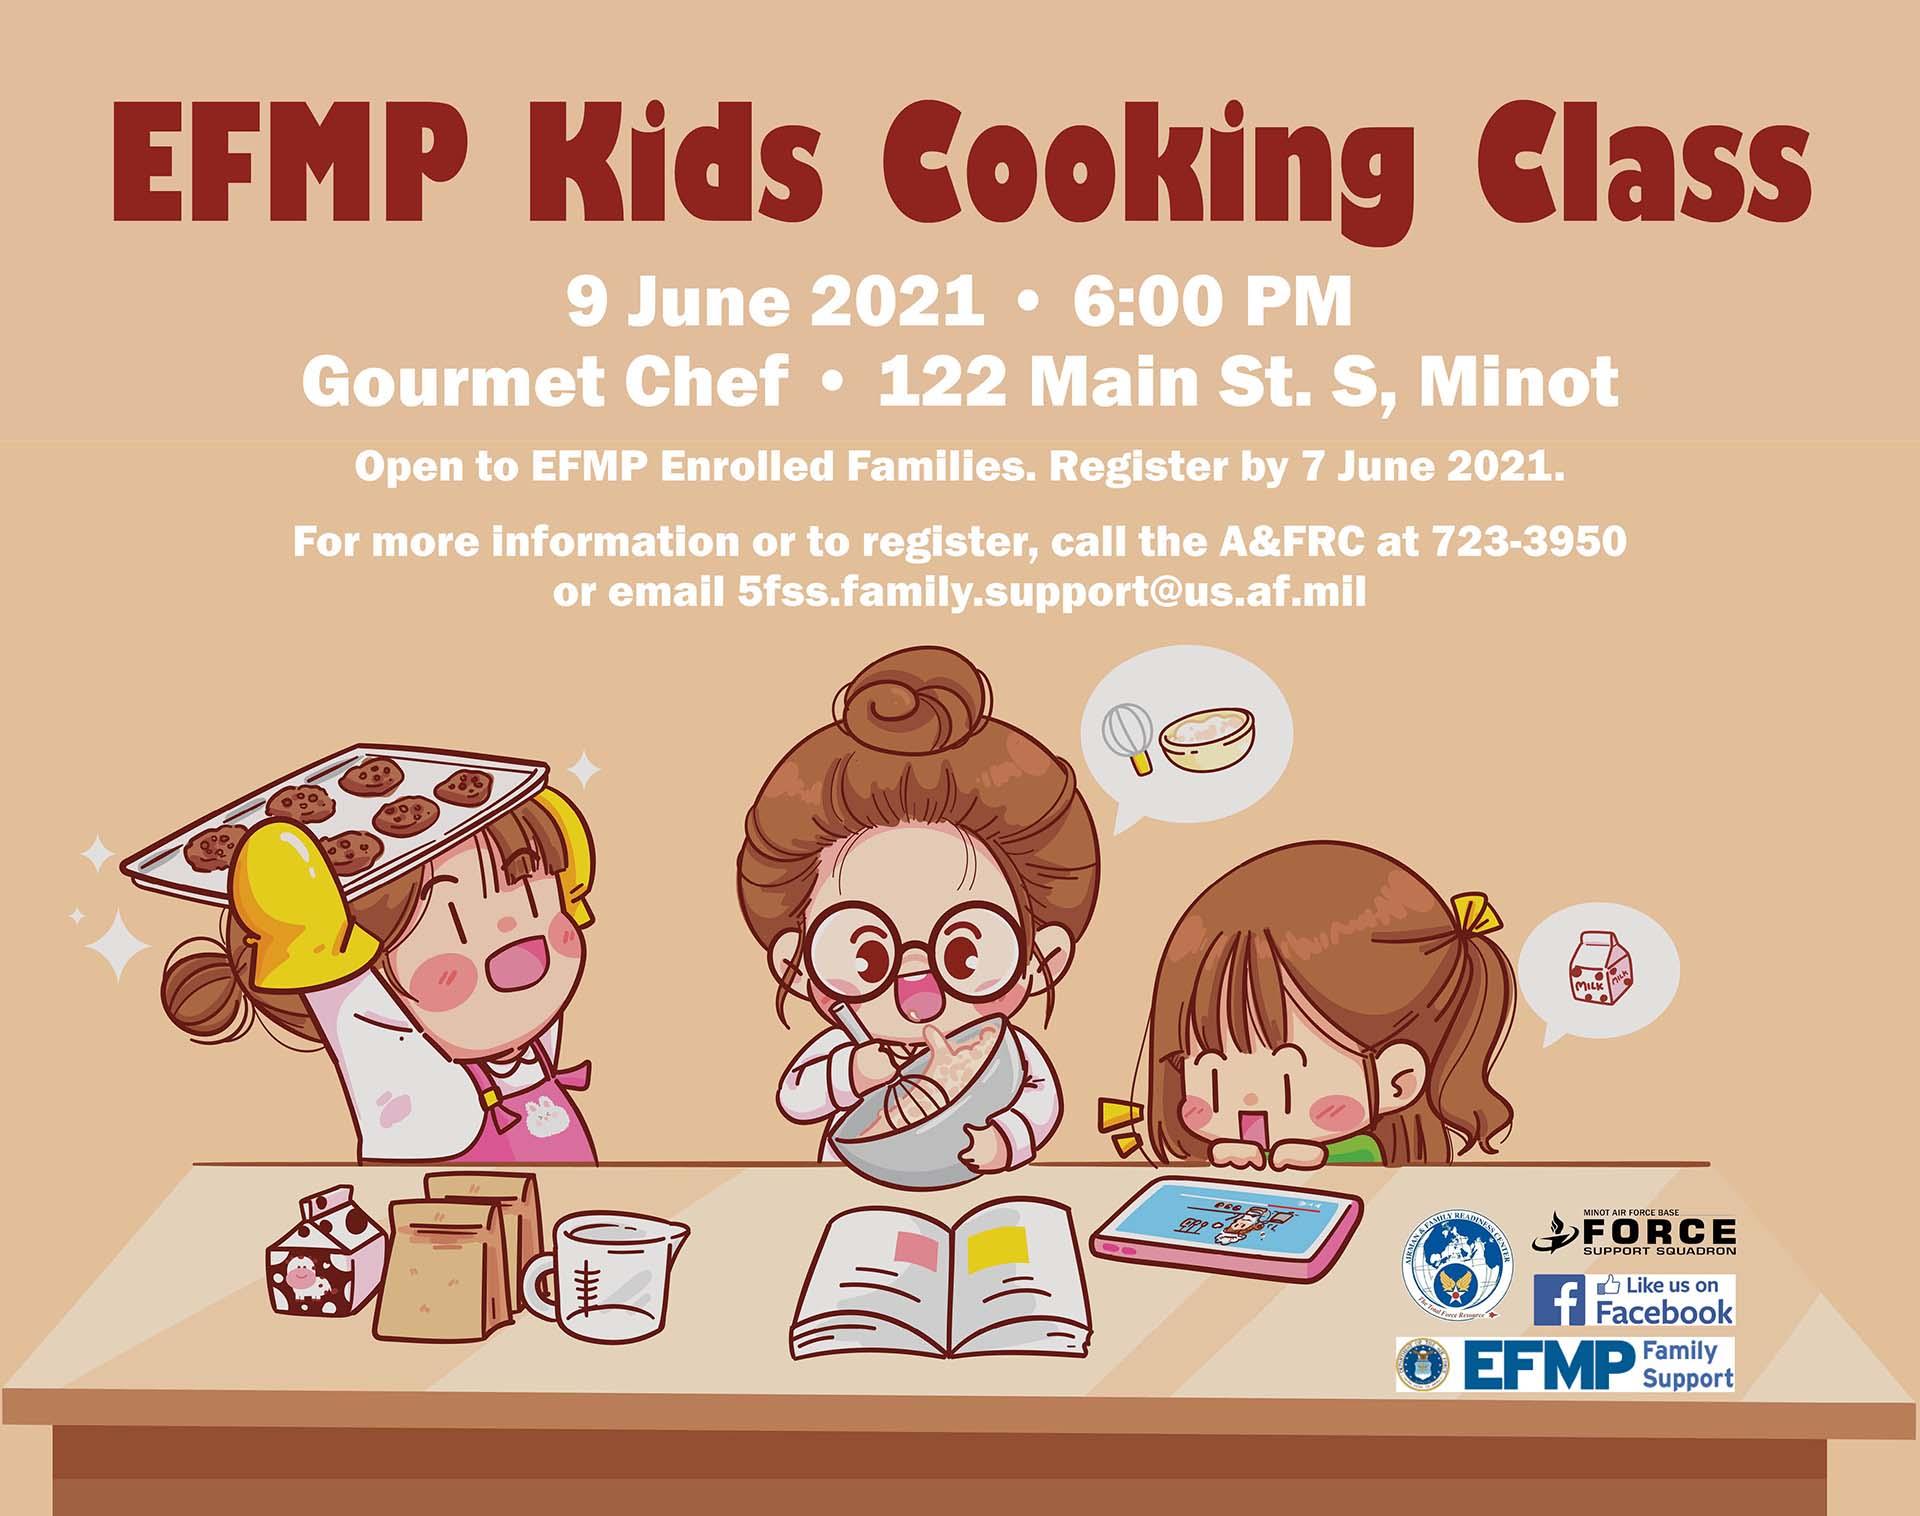 EFMP Kids Cooking Class